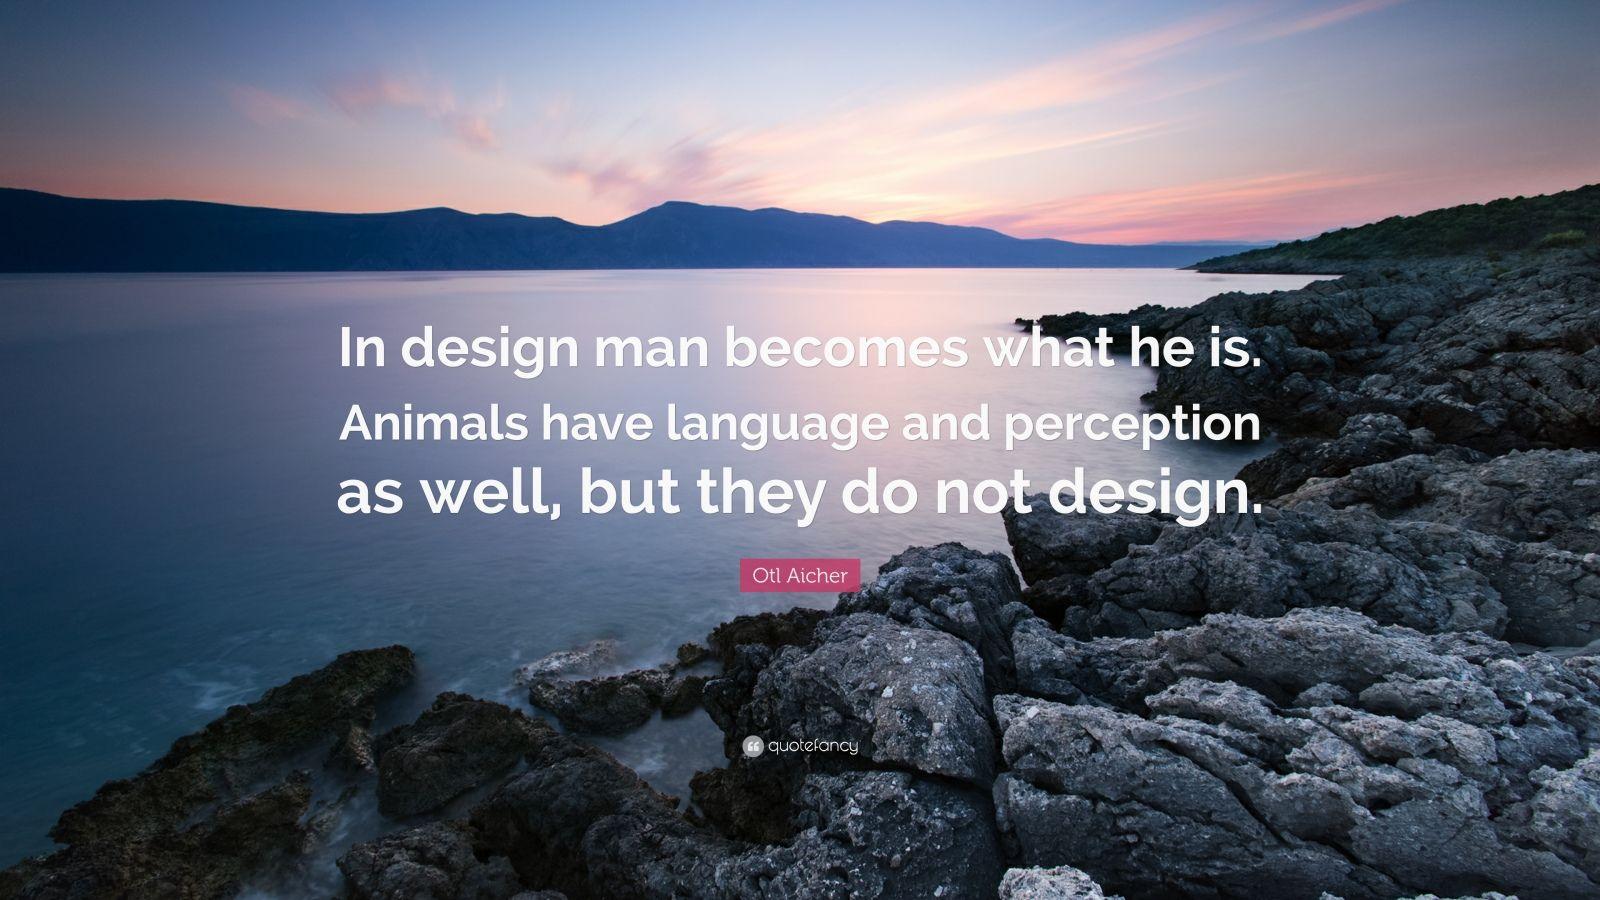 do animals have language